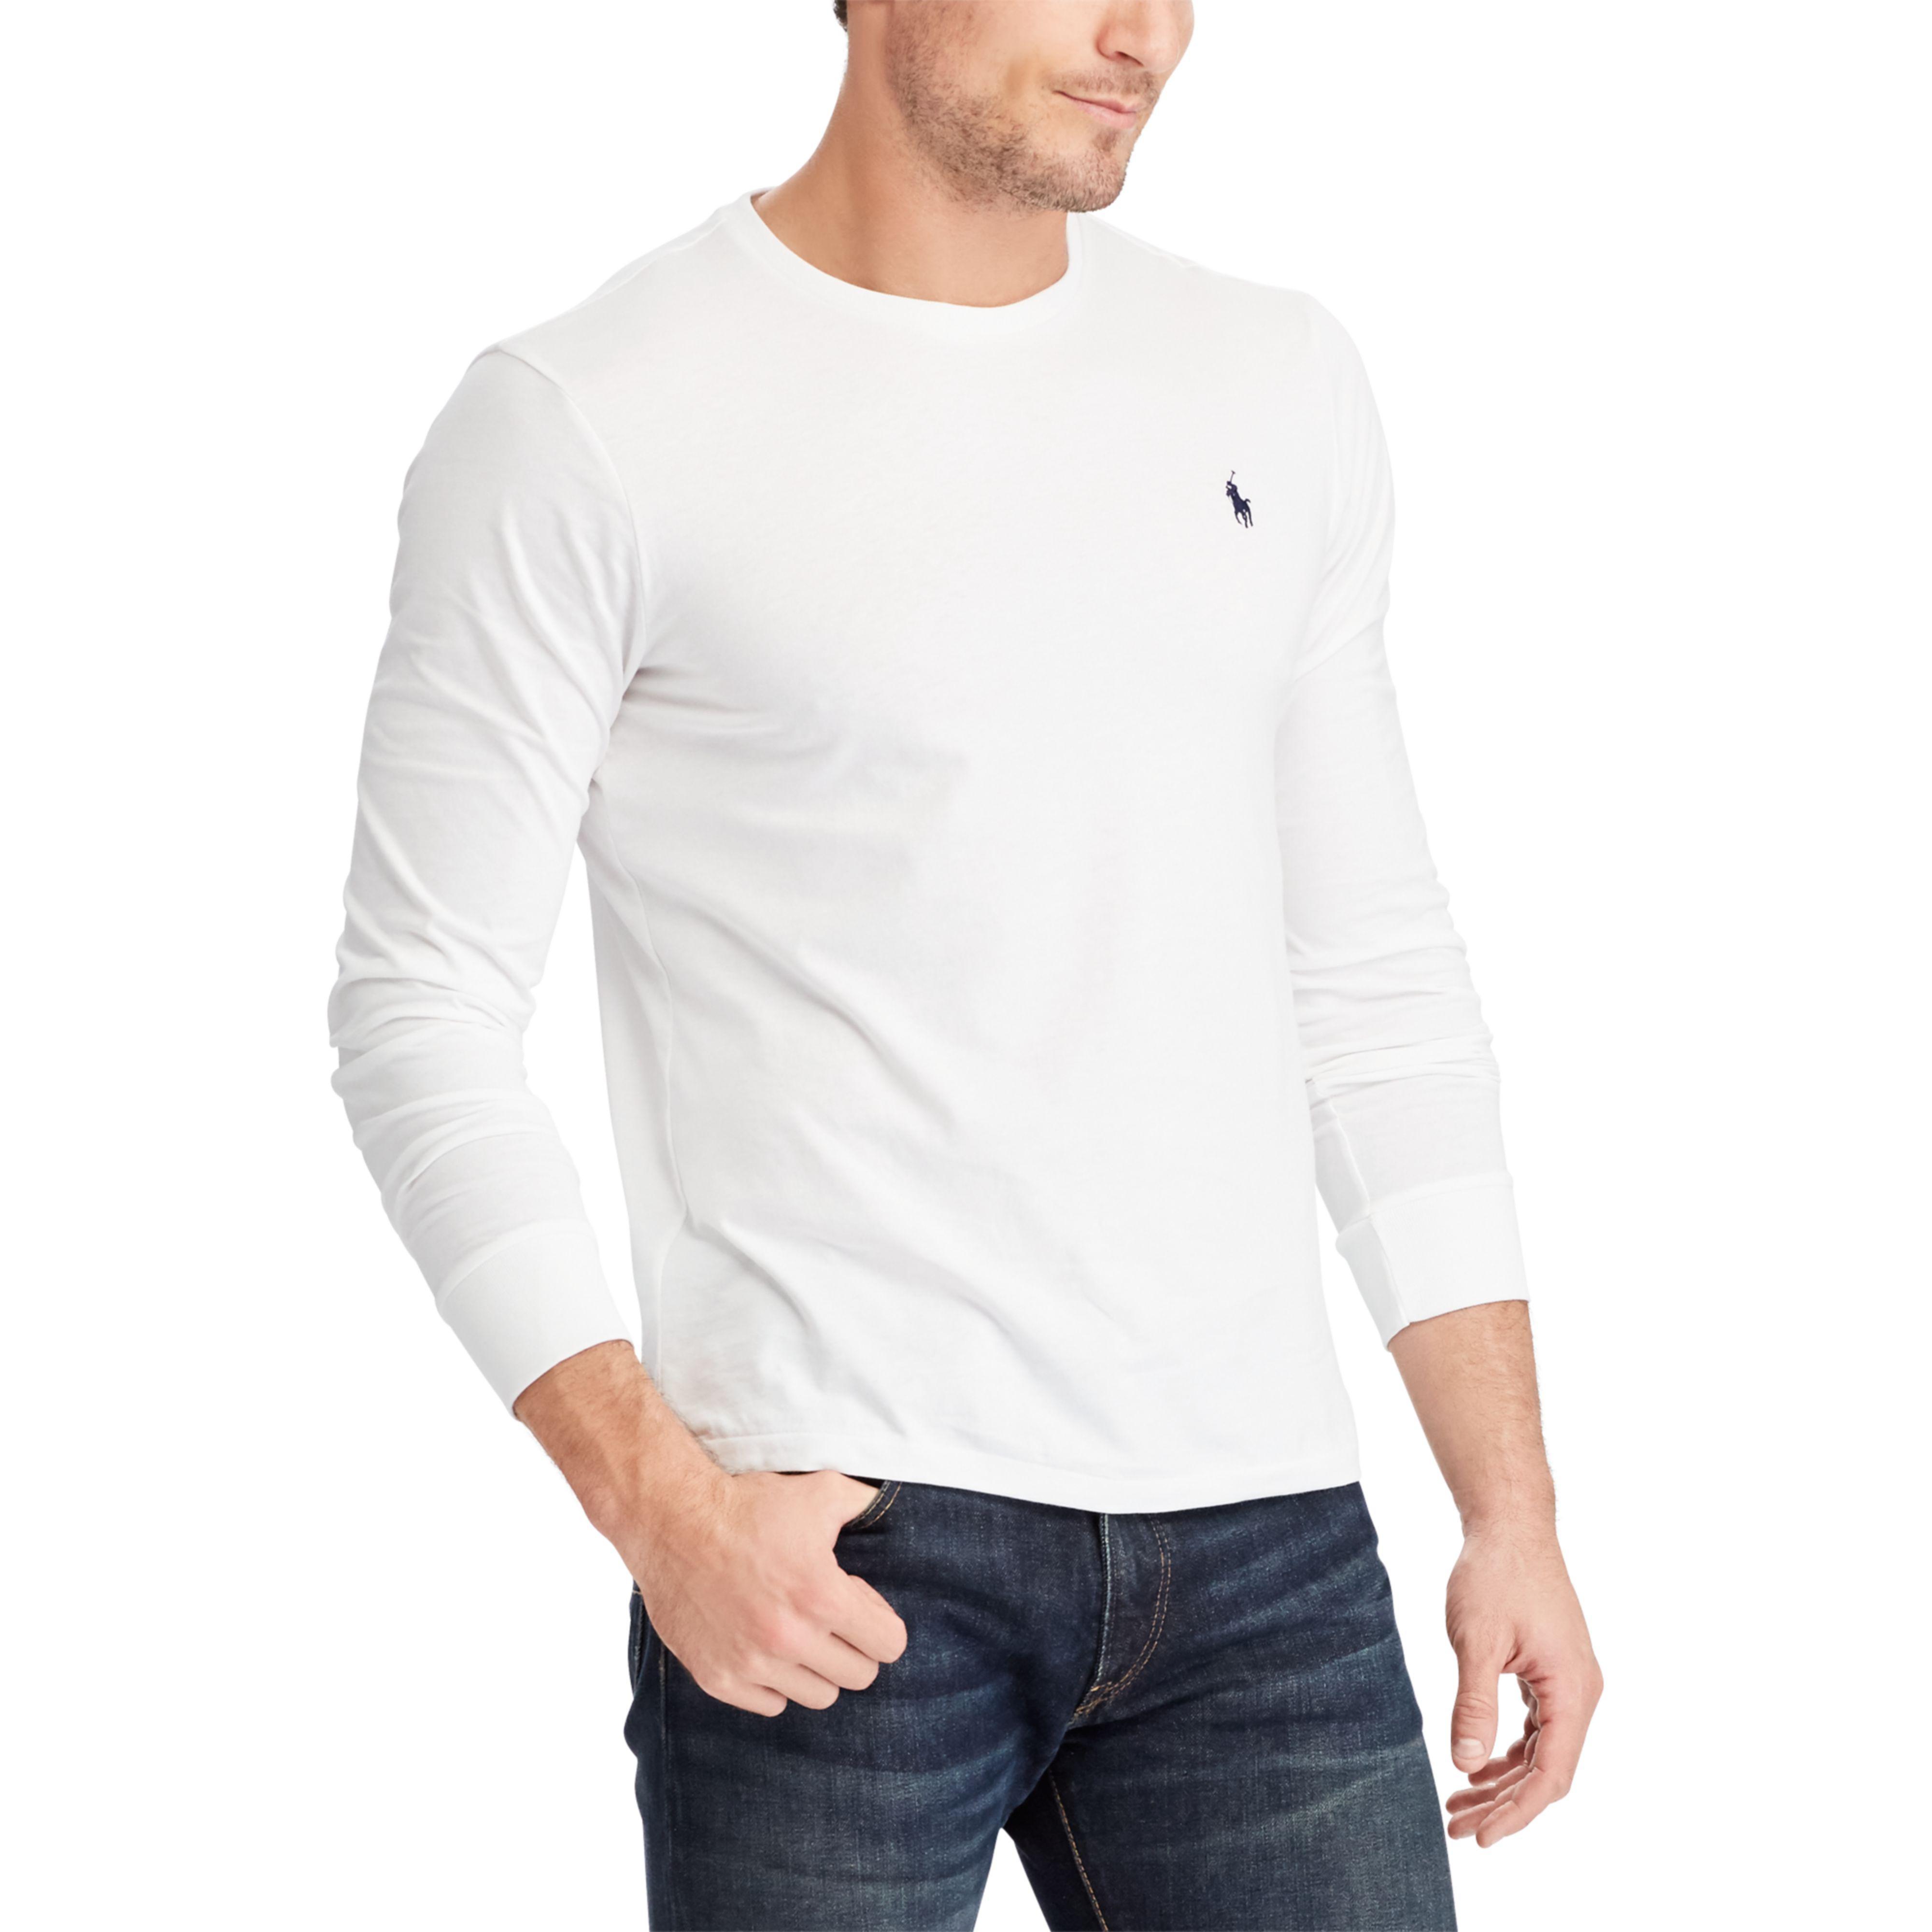 9ff907837883 ... greece lyst polo ralph lauren custom slim fit cotton t shirt in gray  for men 08361